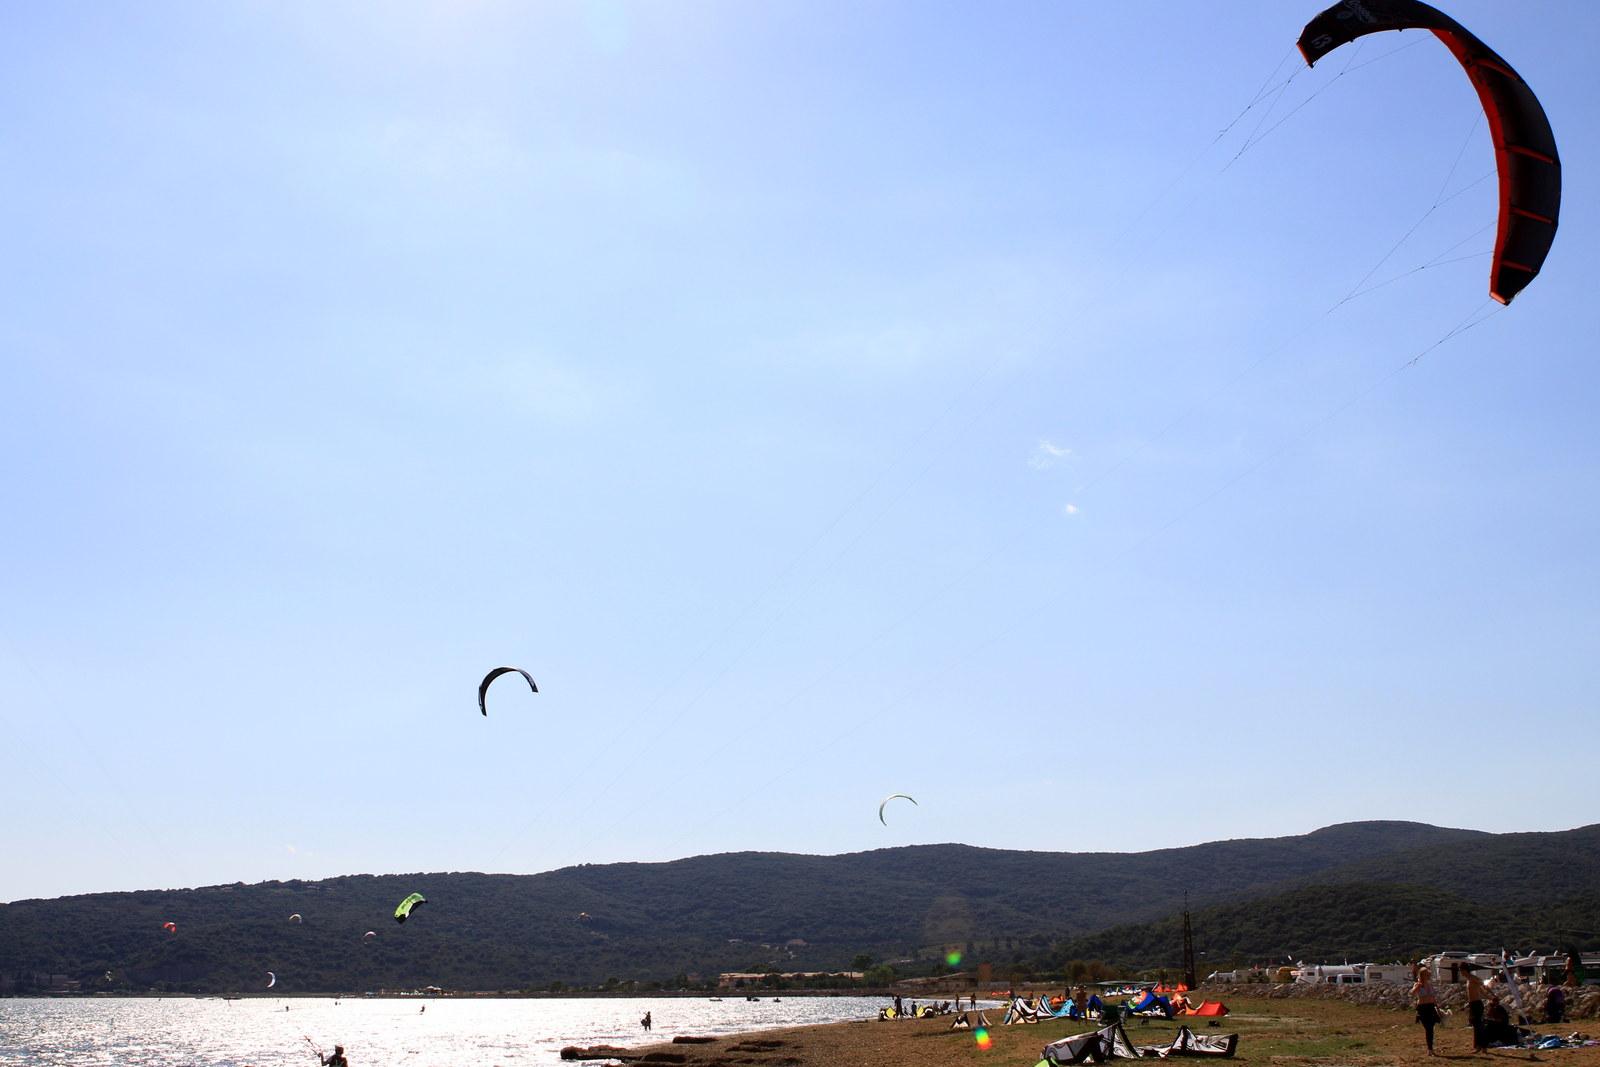 Kitesurfen_Talamone_IMG_4152.JPG